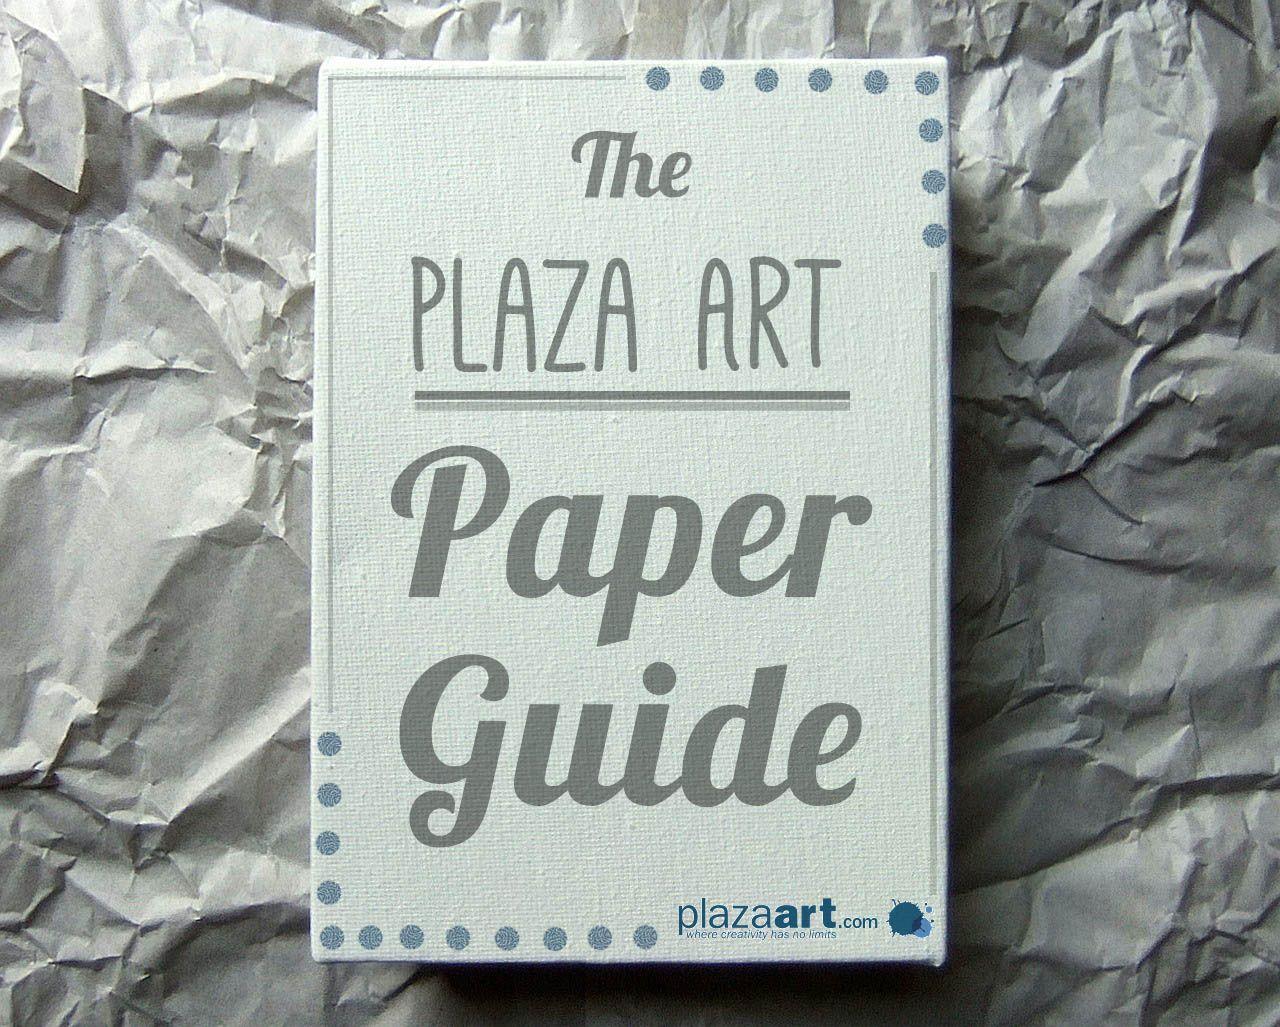 plazaart blog - The Plaza Paper Guide | plazaart.com | Plaza Artist ...